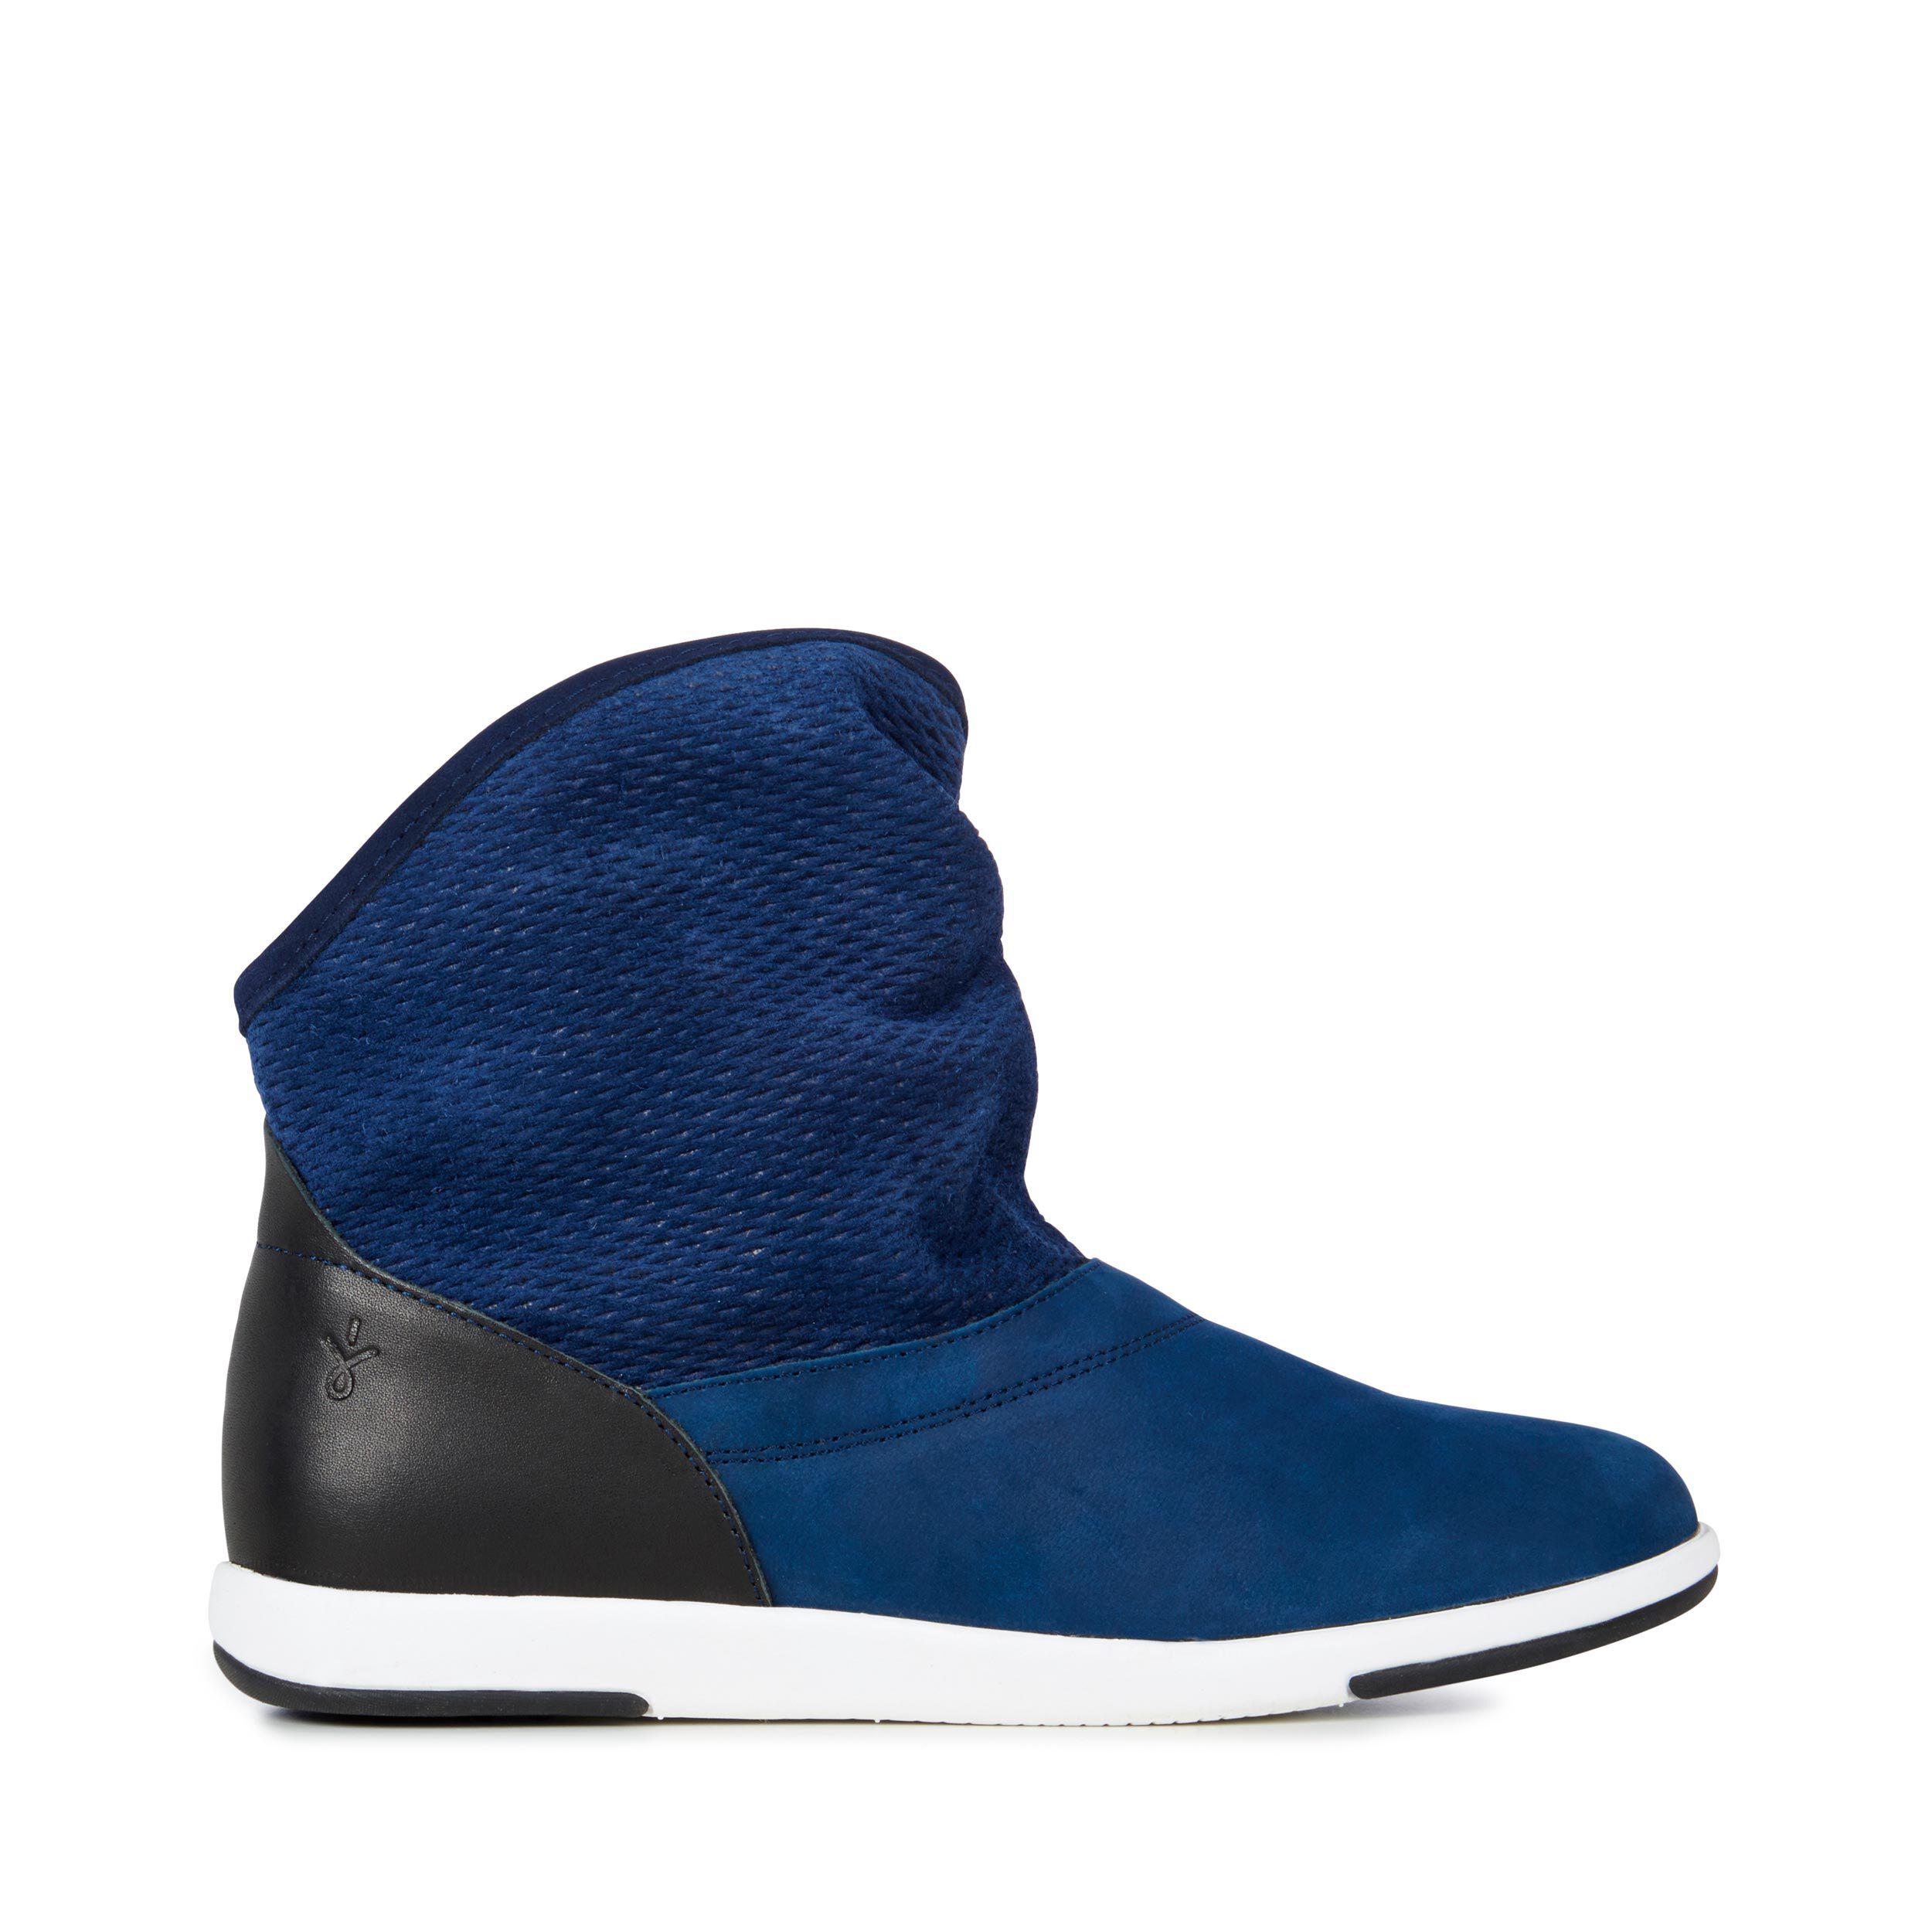 Emu Australia NUMERALLA W11071 Damen Schuhe Stiefel Boots